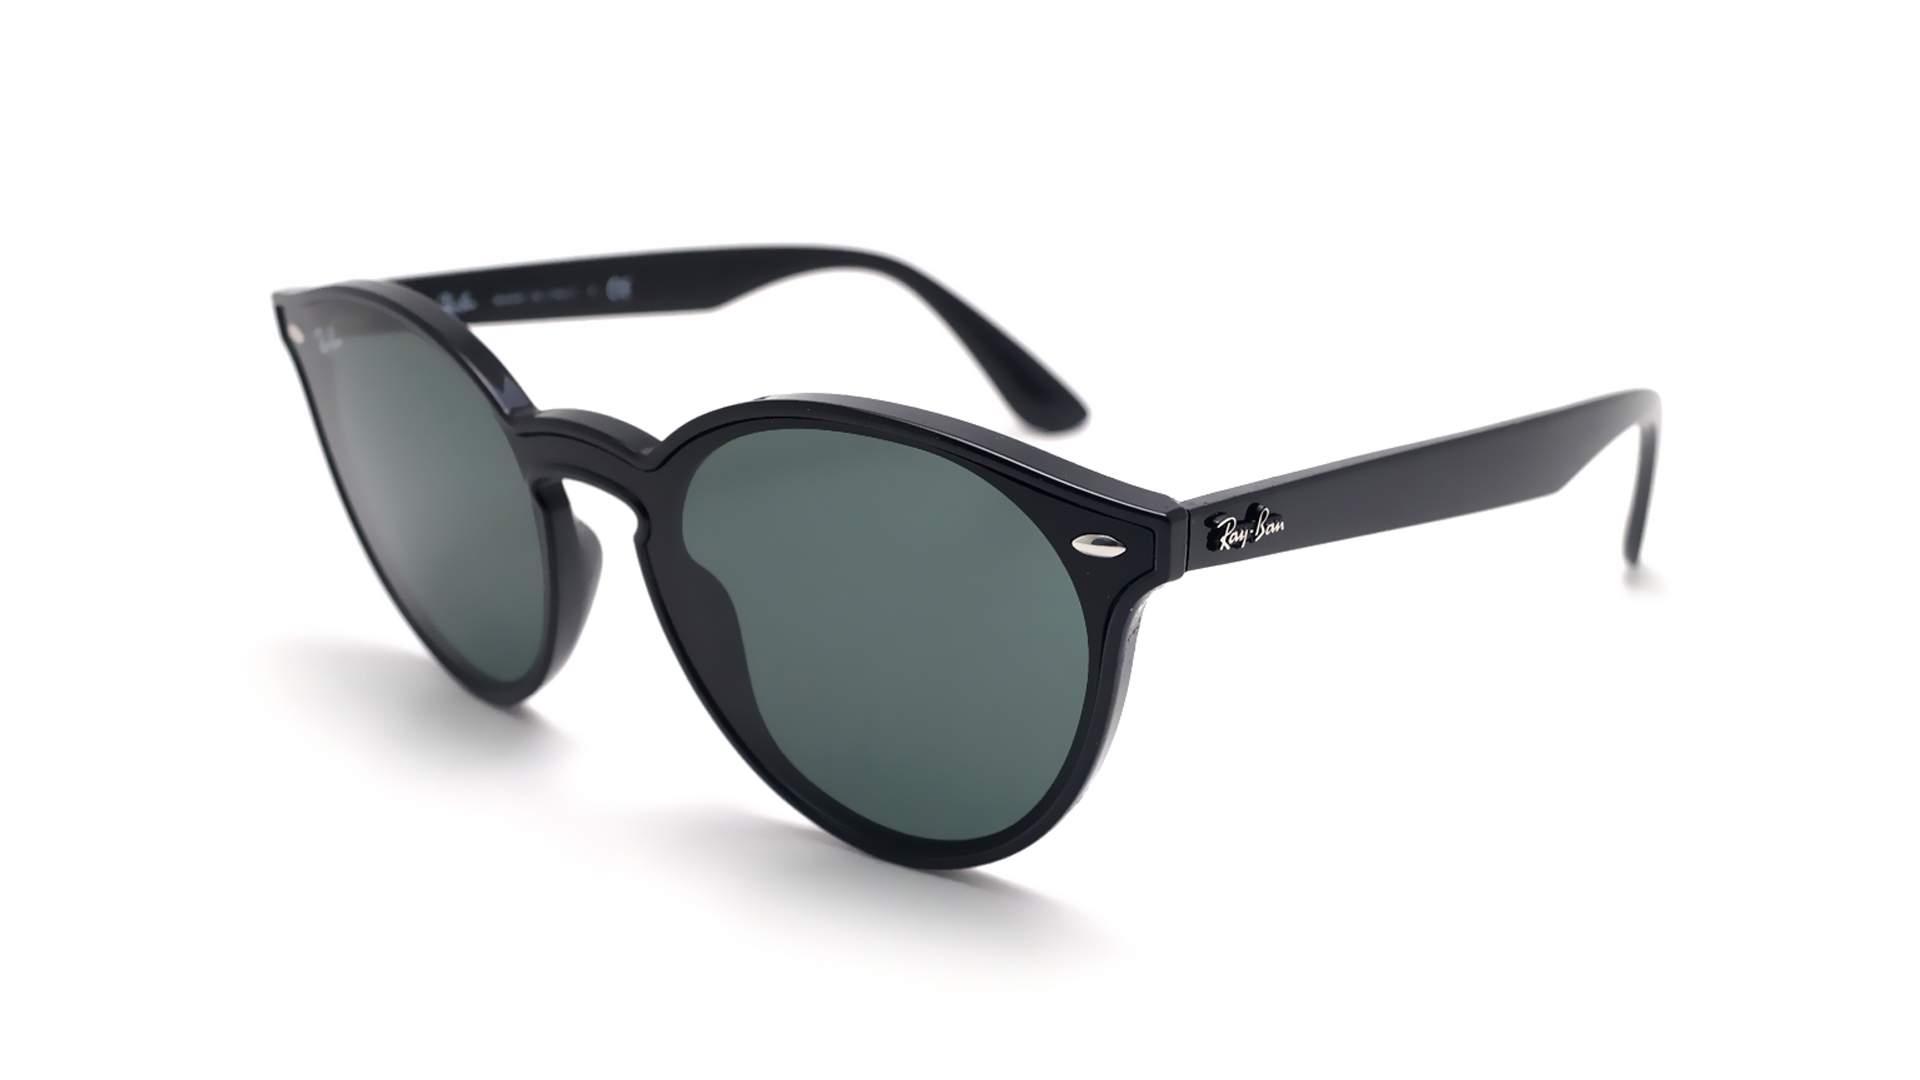 f2b1ddf42a1d3 Sunglasses Ray-Ban Blaze RB4380N 601 71 37-17 Black Medium